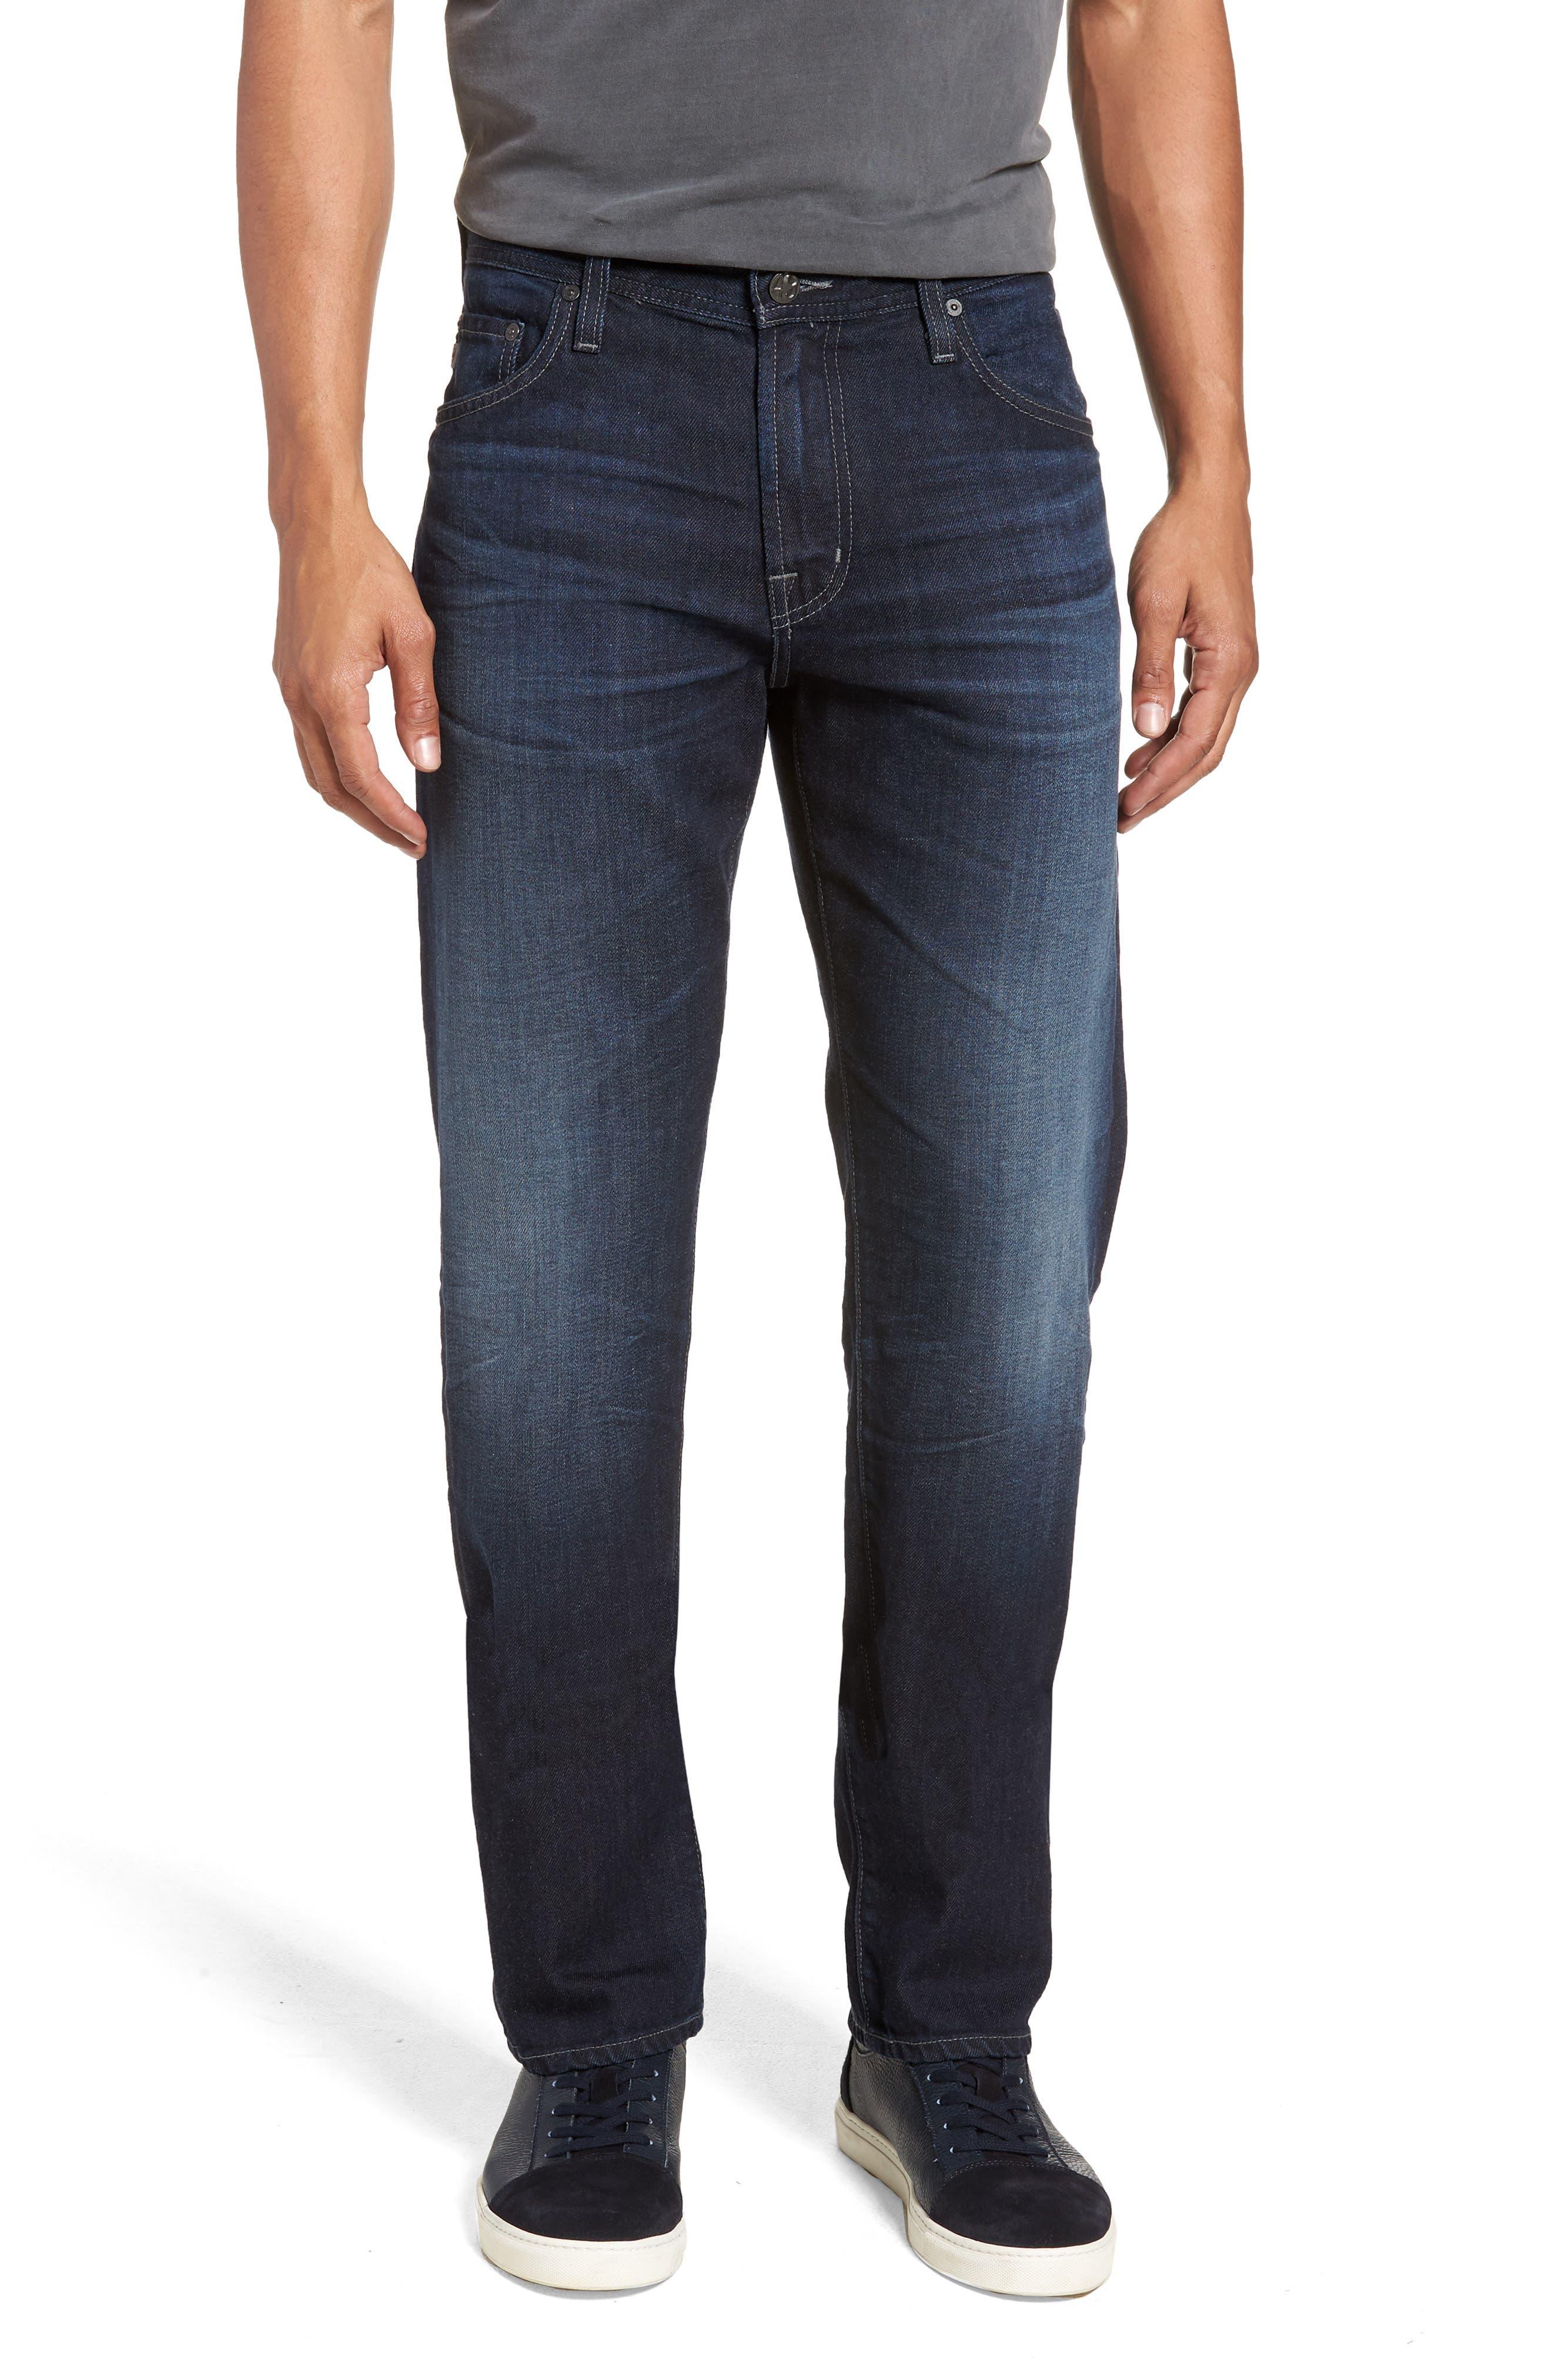 Graduate Slim Straight Leg Jeans,                         Main,                         color, 486